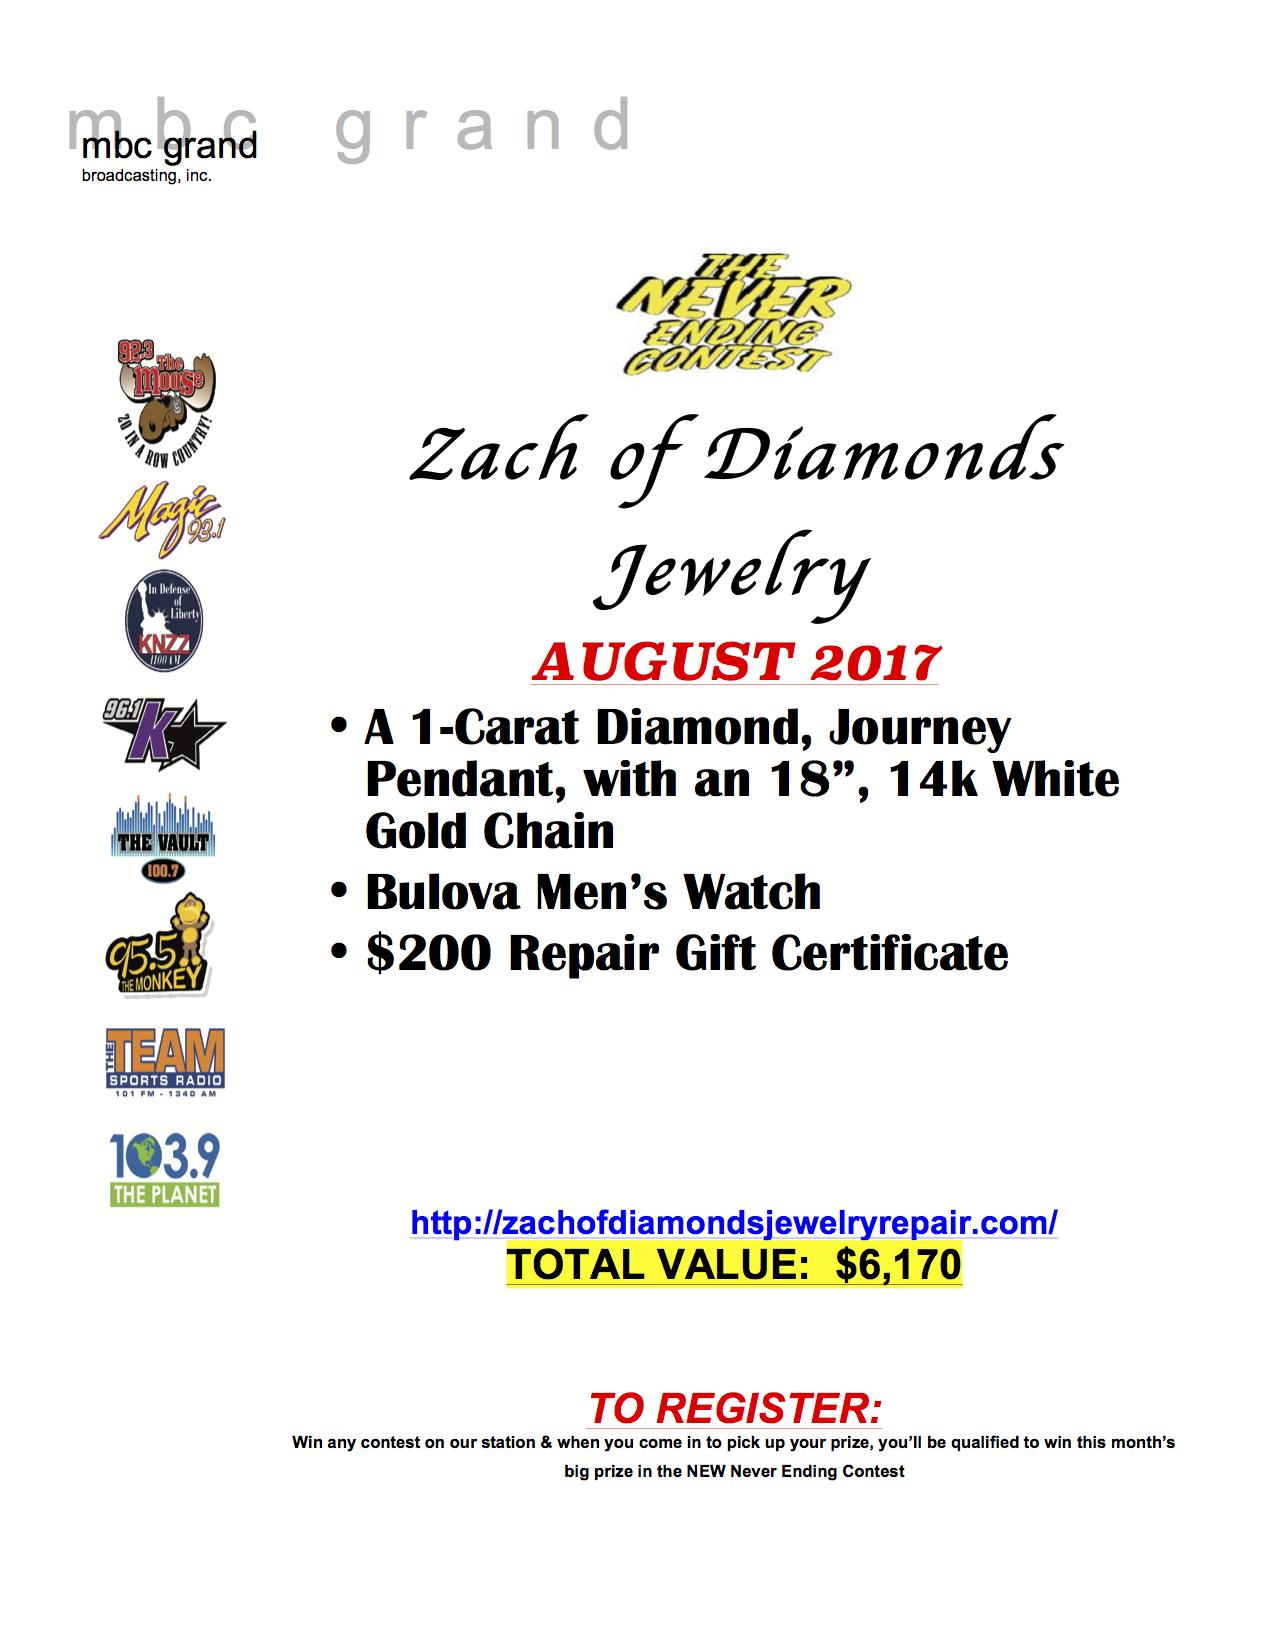 zach-of-diamonds-info-sheet-aug-2017